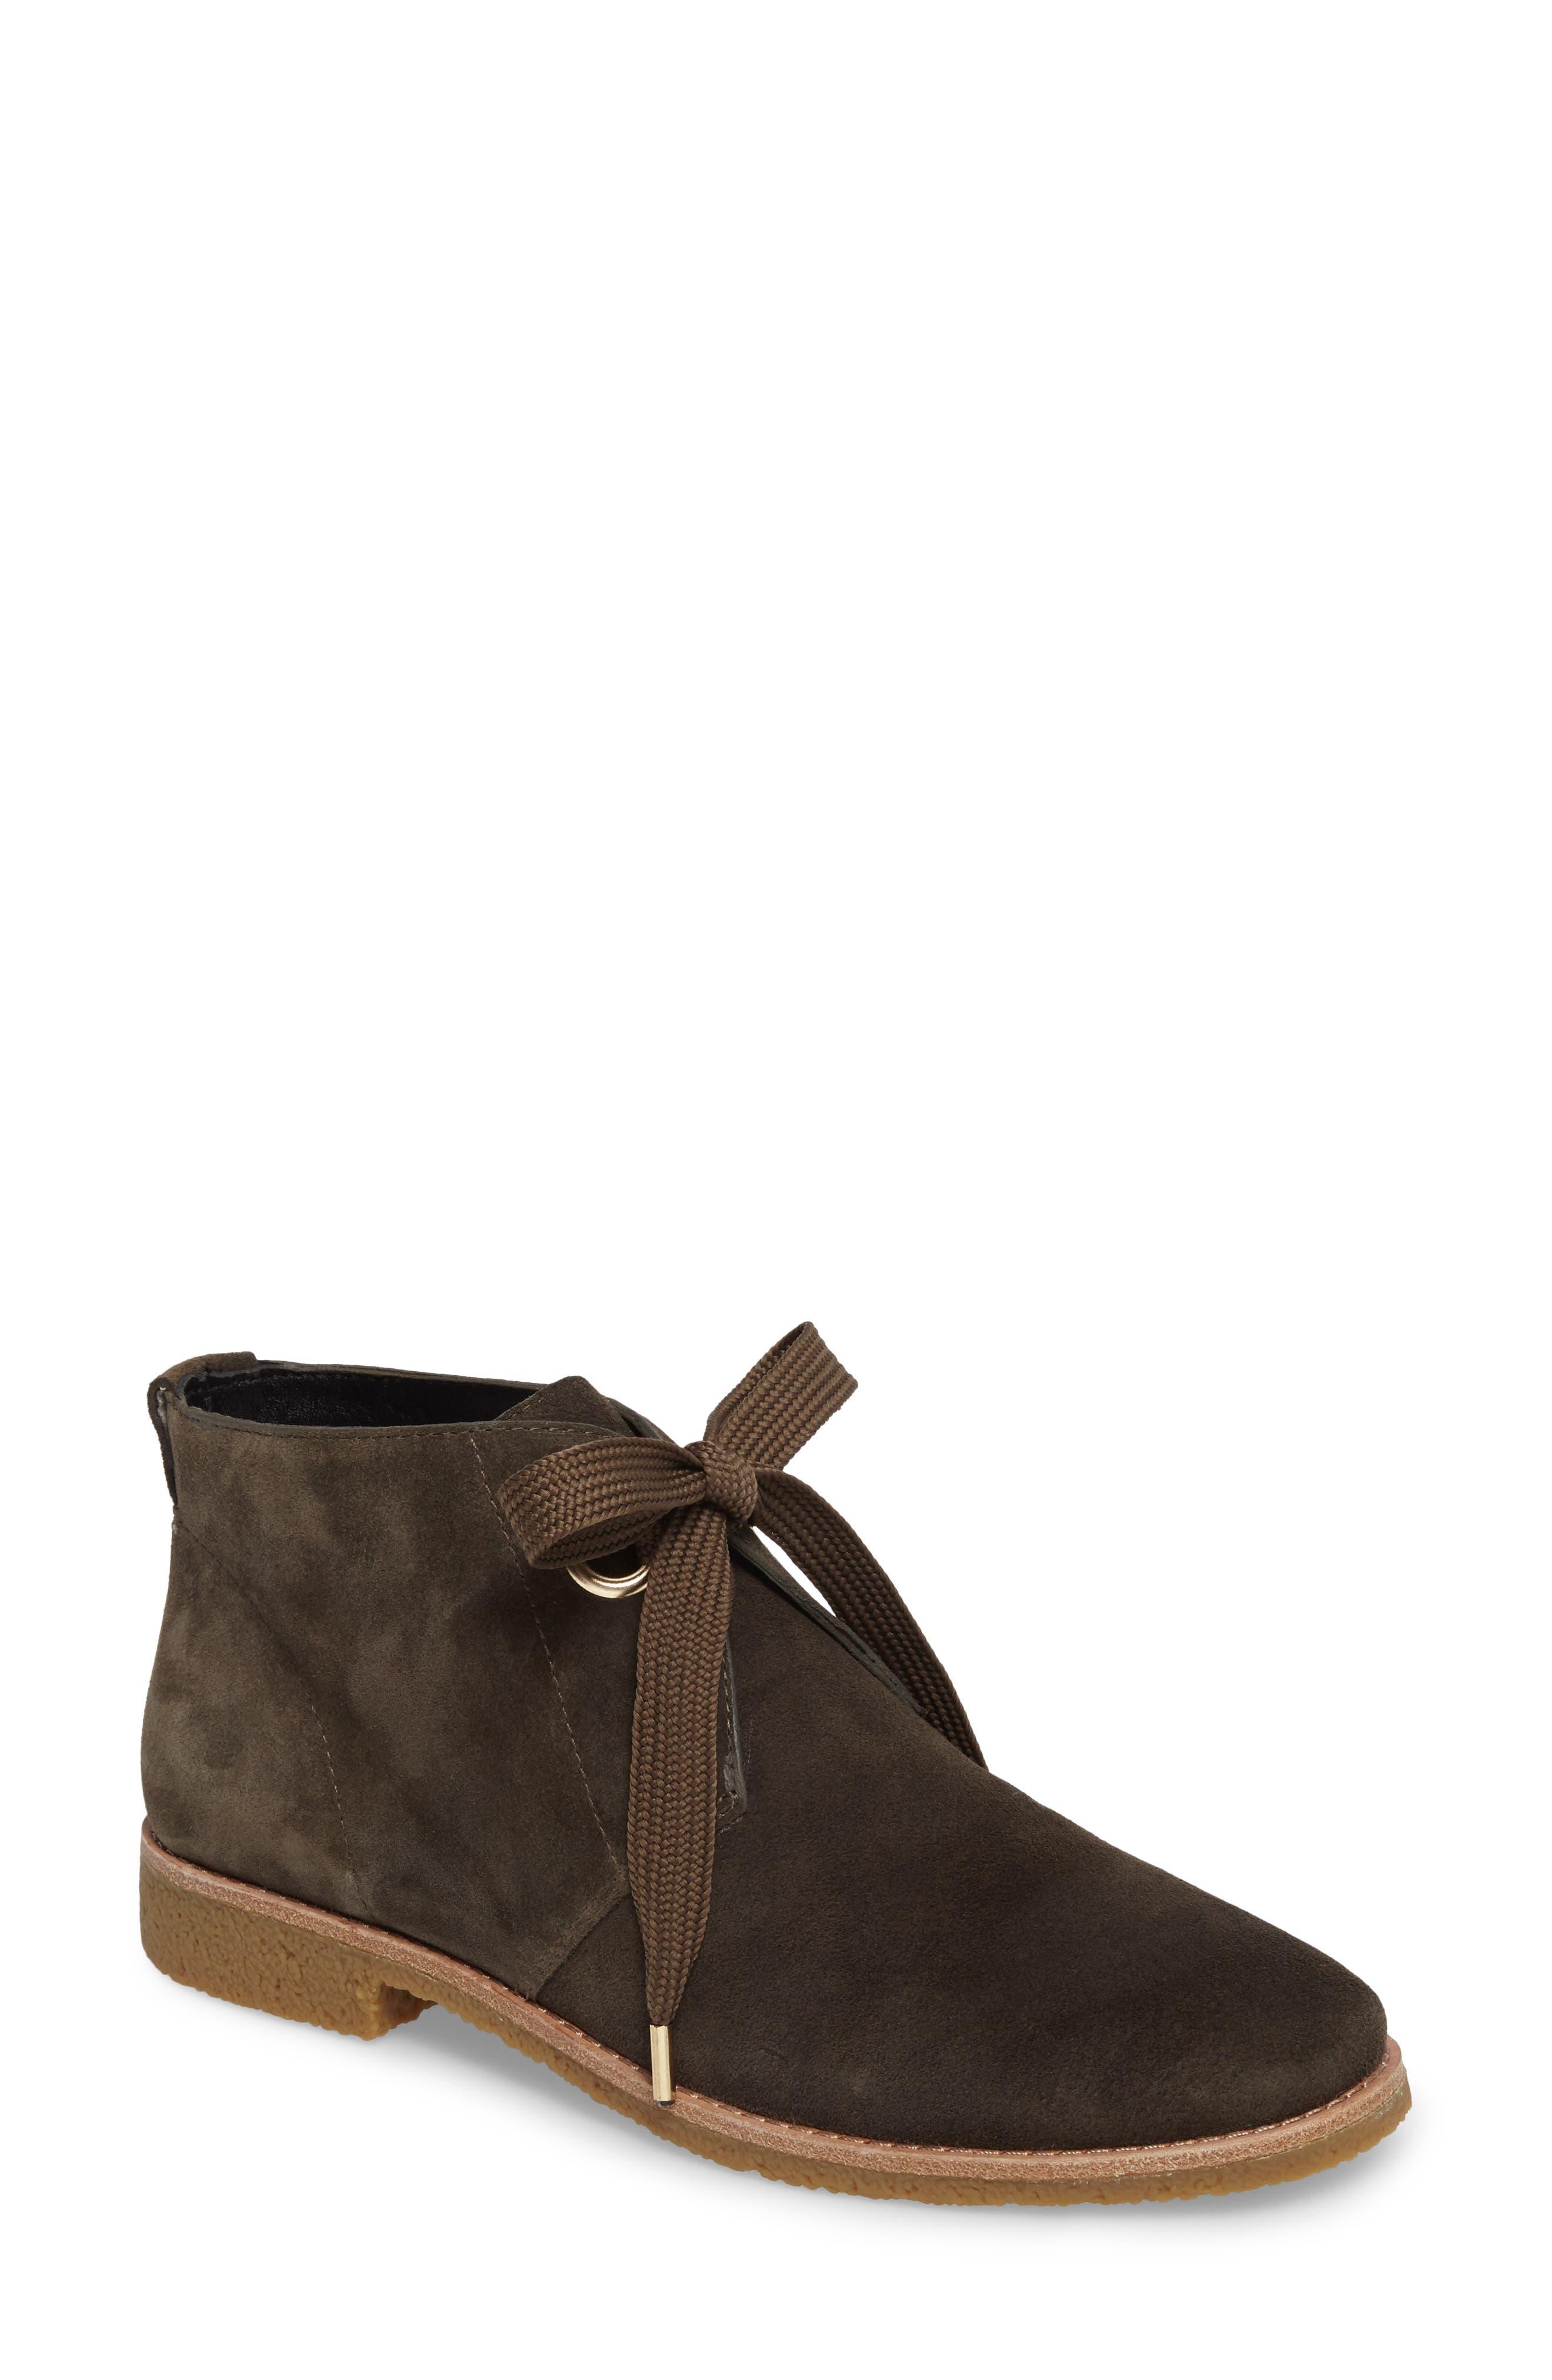 Alternate Image 1 Selected - kate spade new york barrow chukka boot (Women)